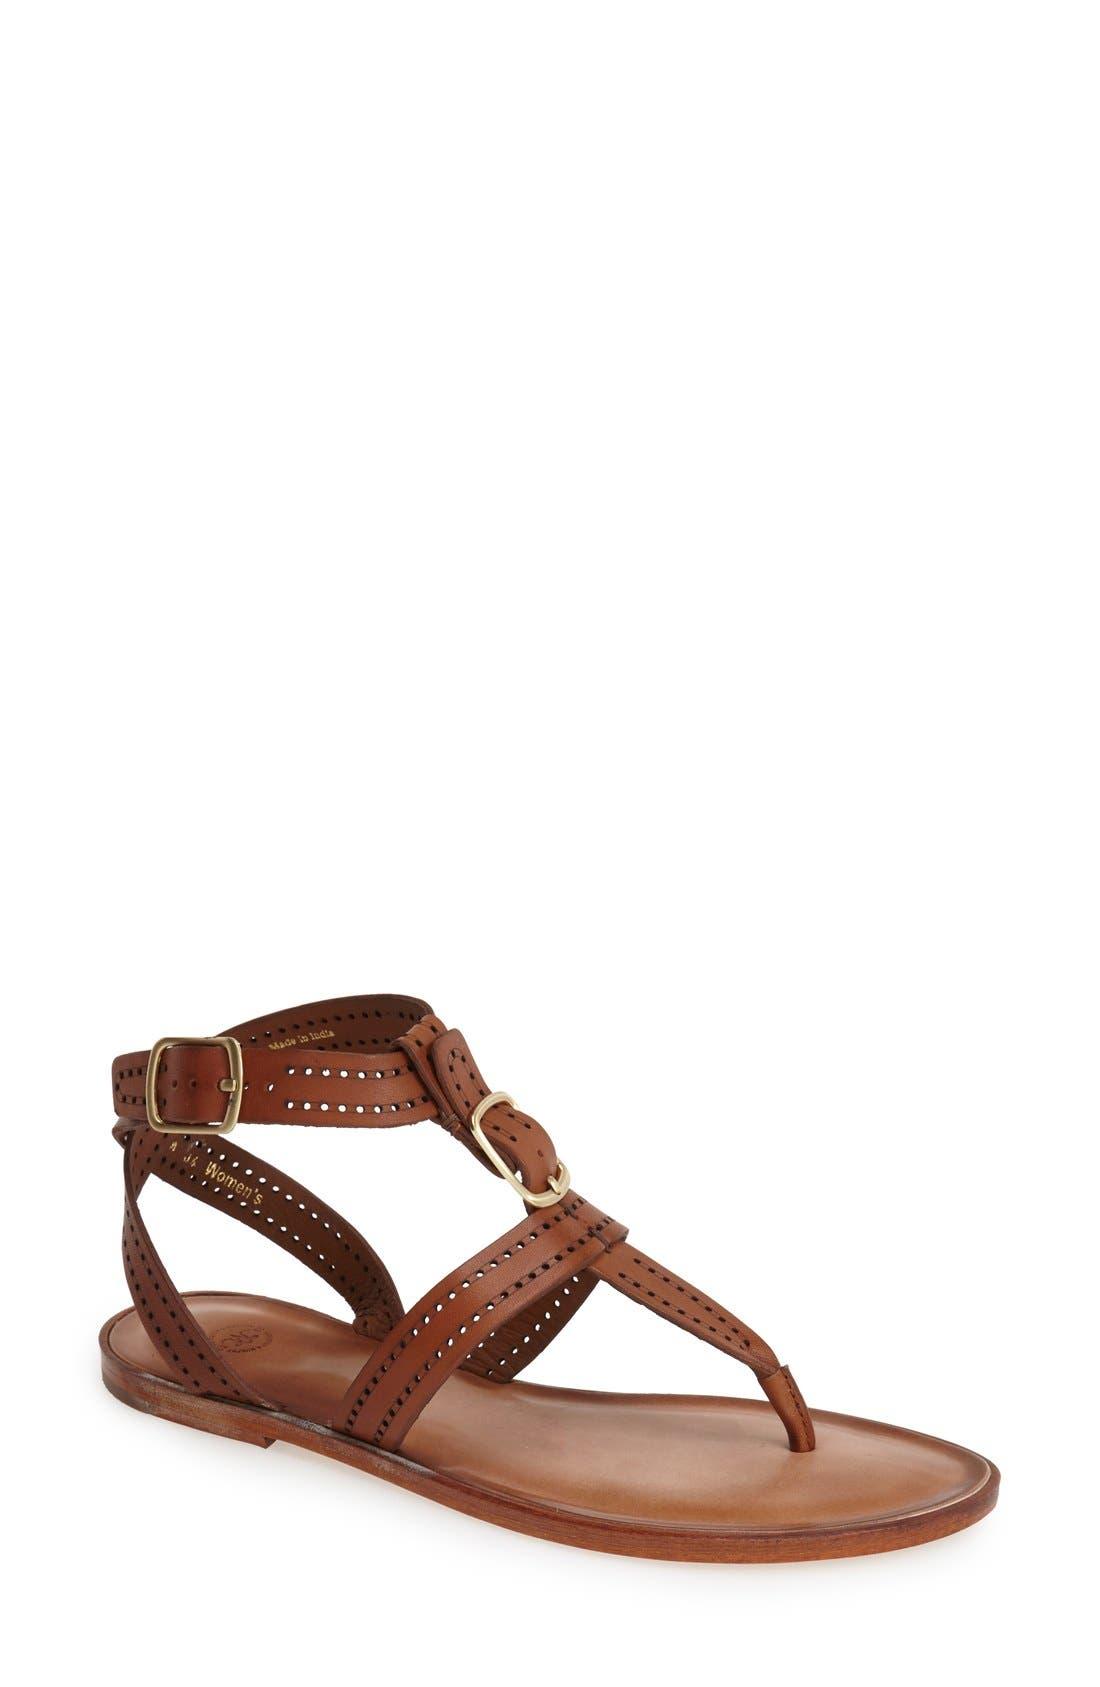 Alternate Image 1 Selected - Johnston & Murphy 'Patti' Perforated Leather Thong Sandal (Women)